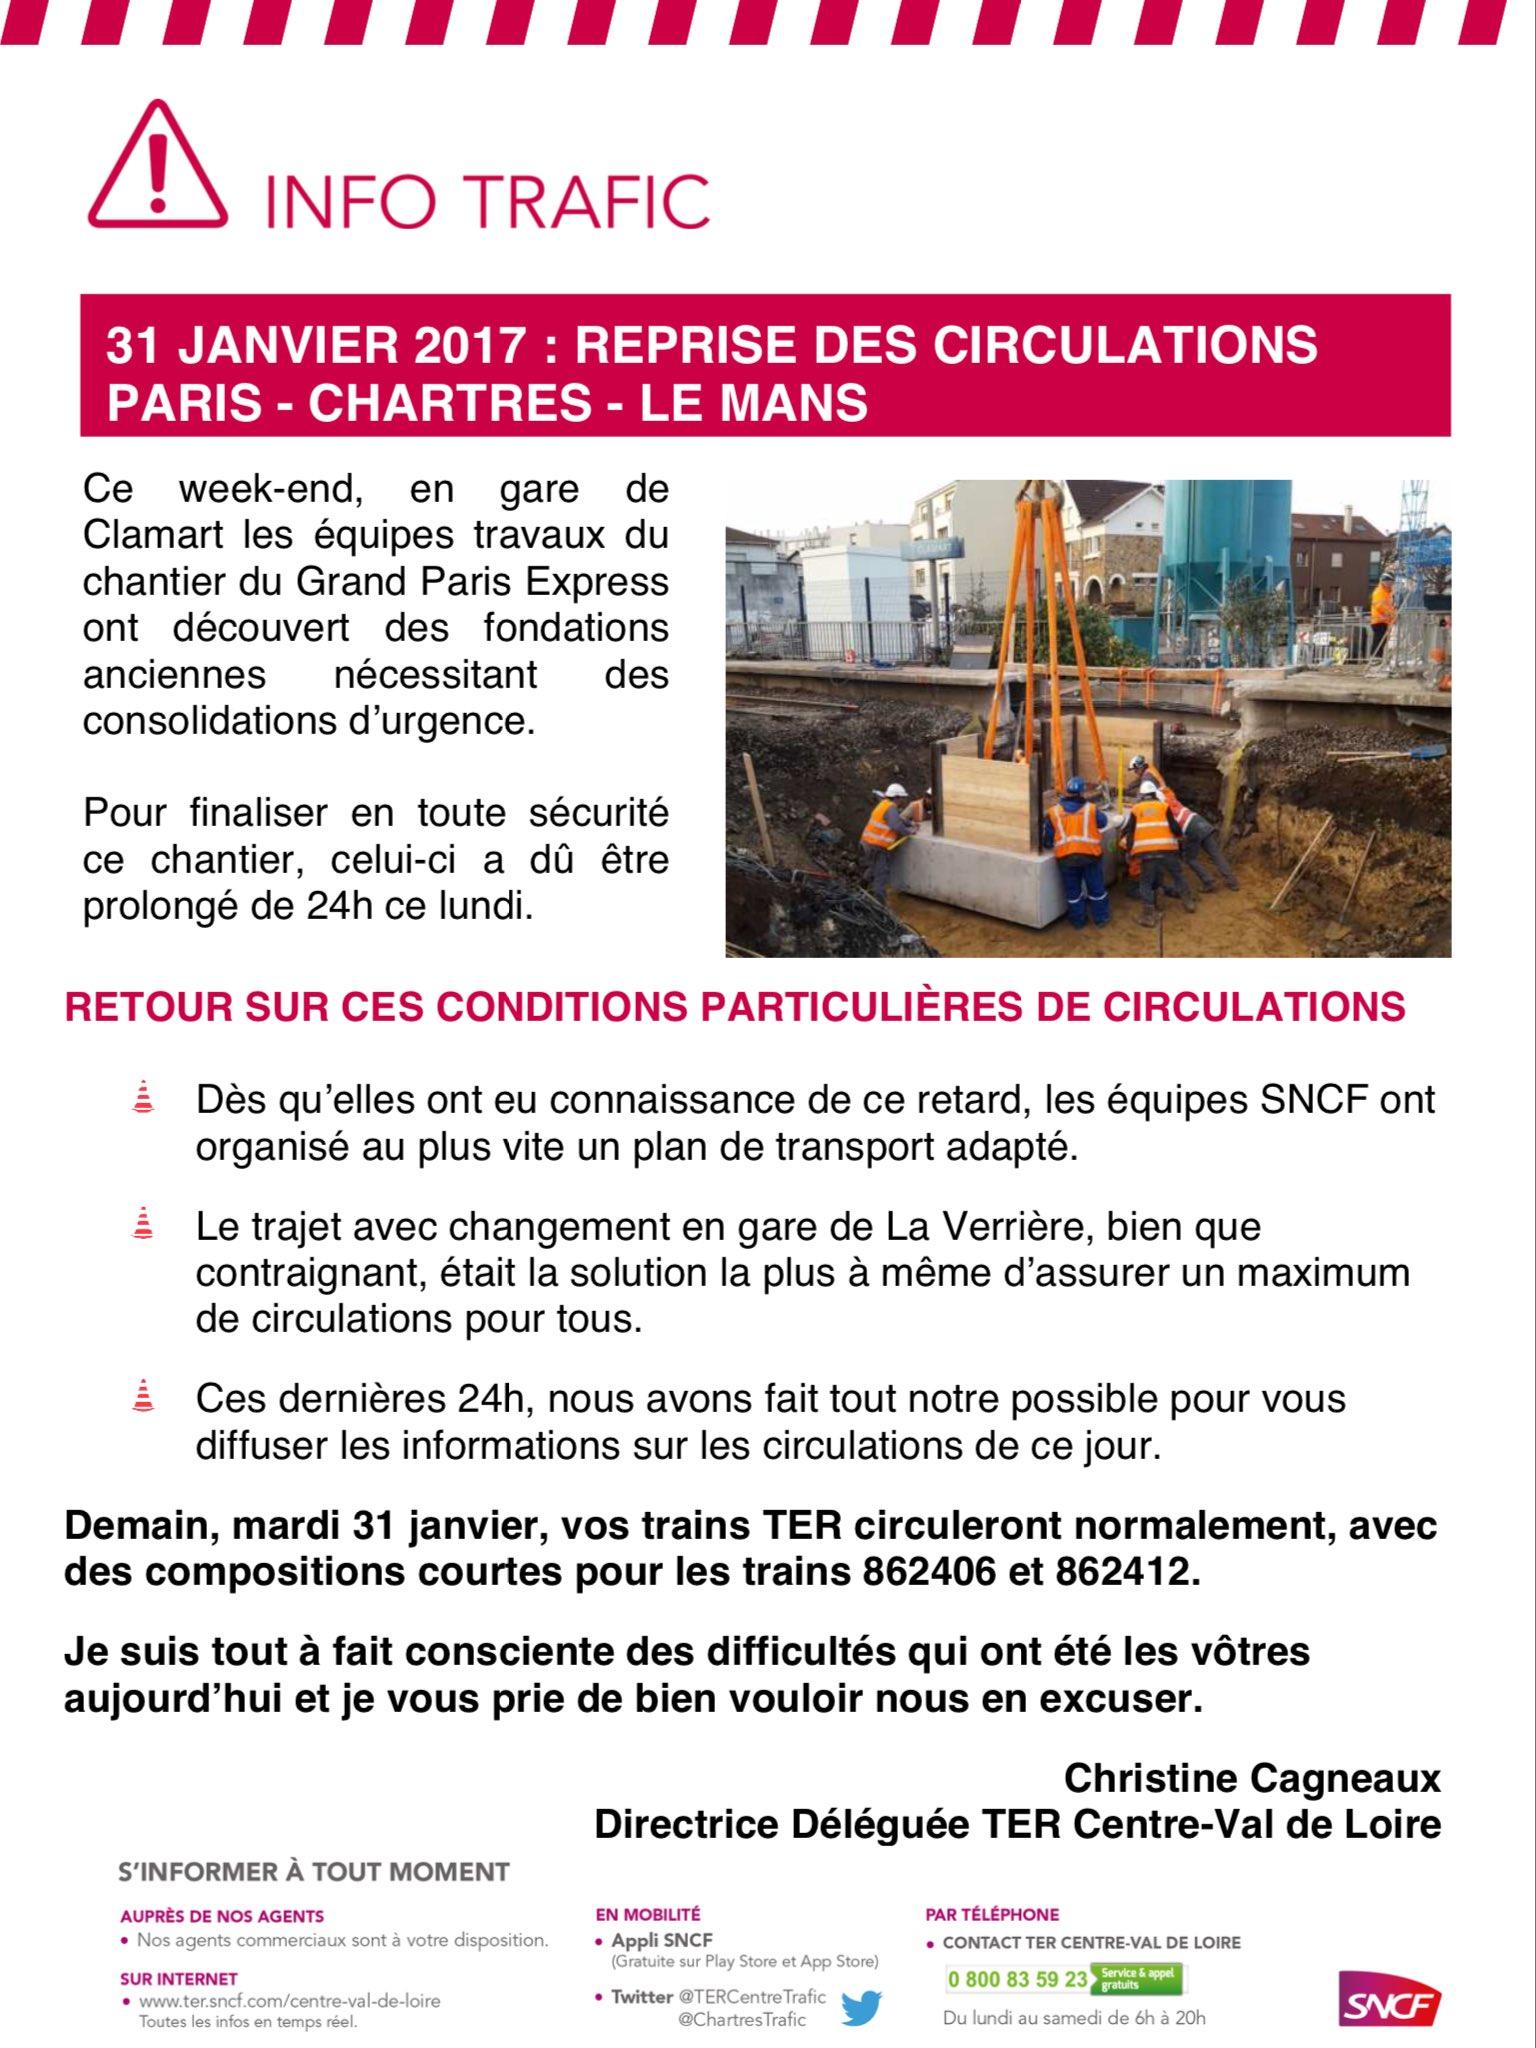 Info trafic du 31 janvier 2017